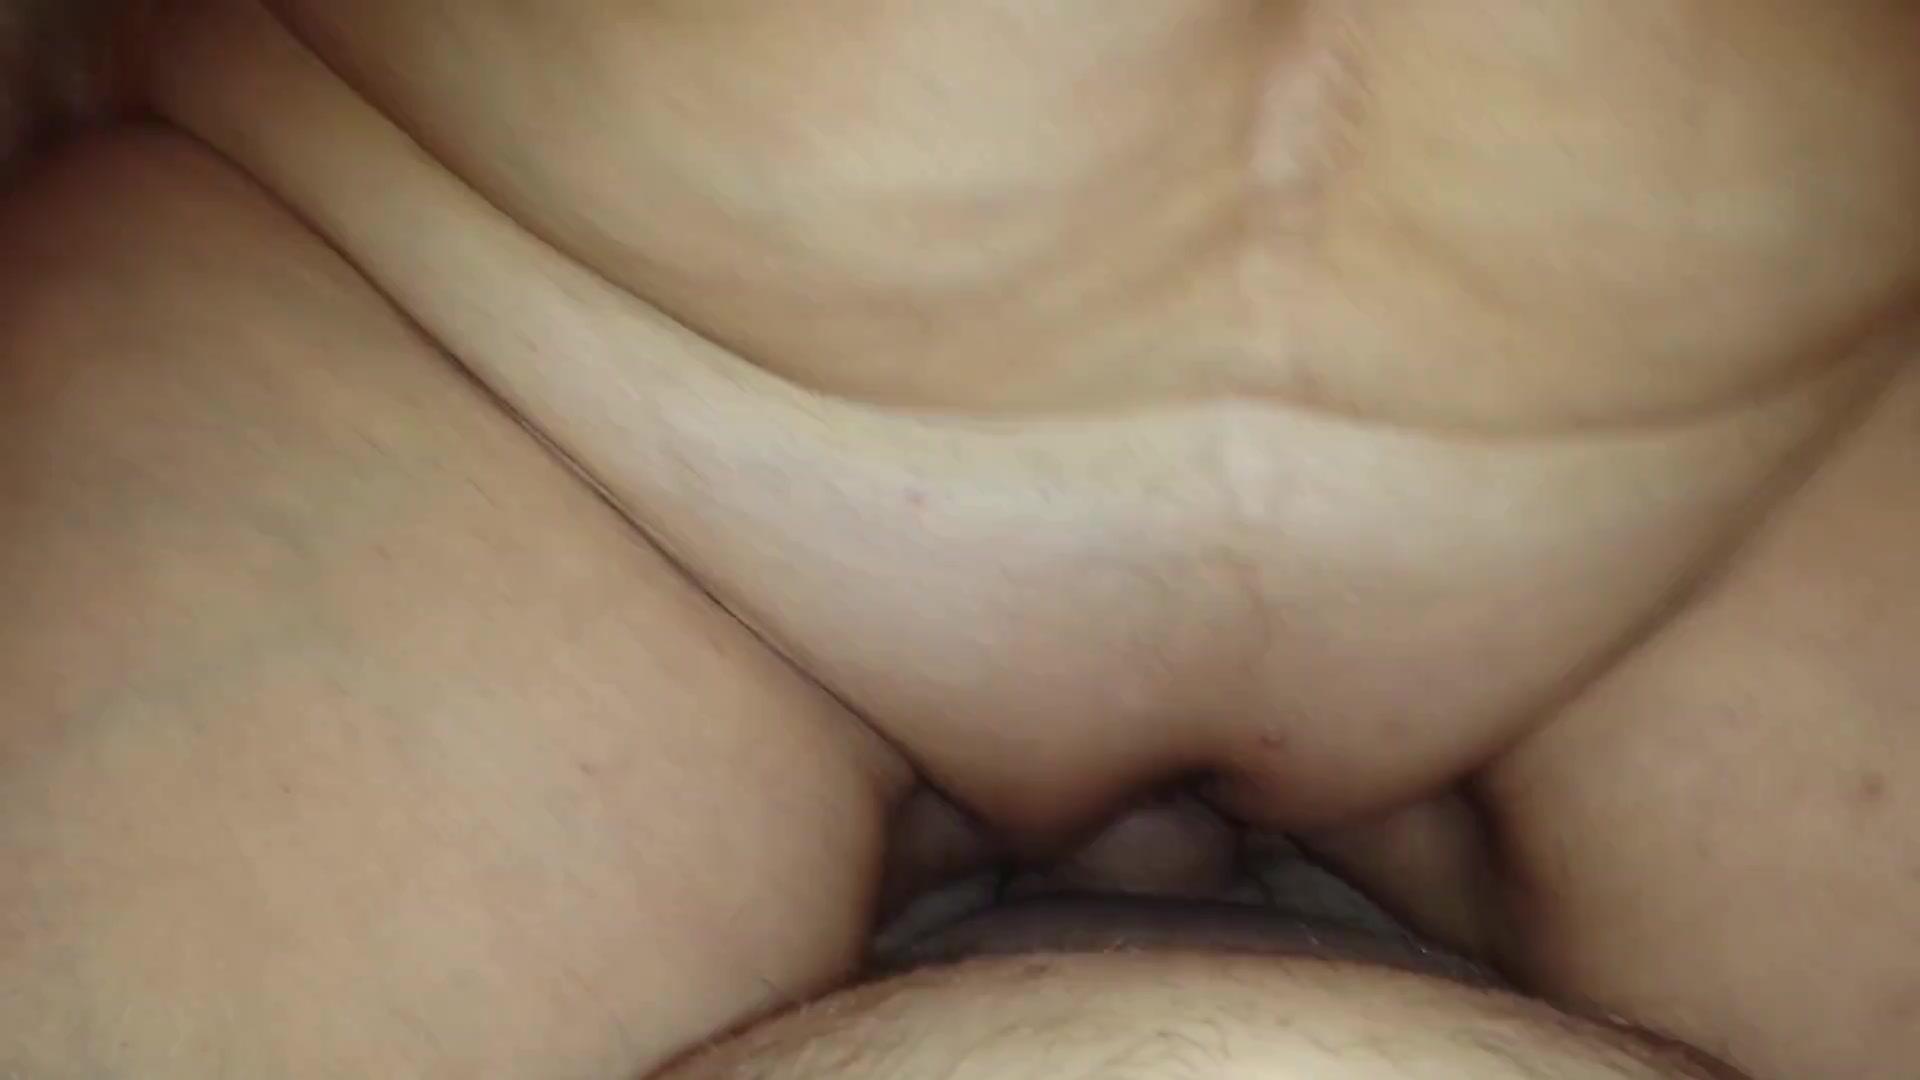 Animated Stepson And Stepmom Having Sex Porn cum inside stepmom pussy stepmom and step son - free porn